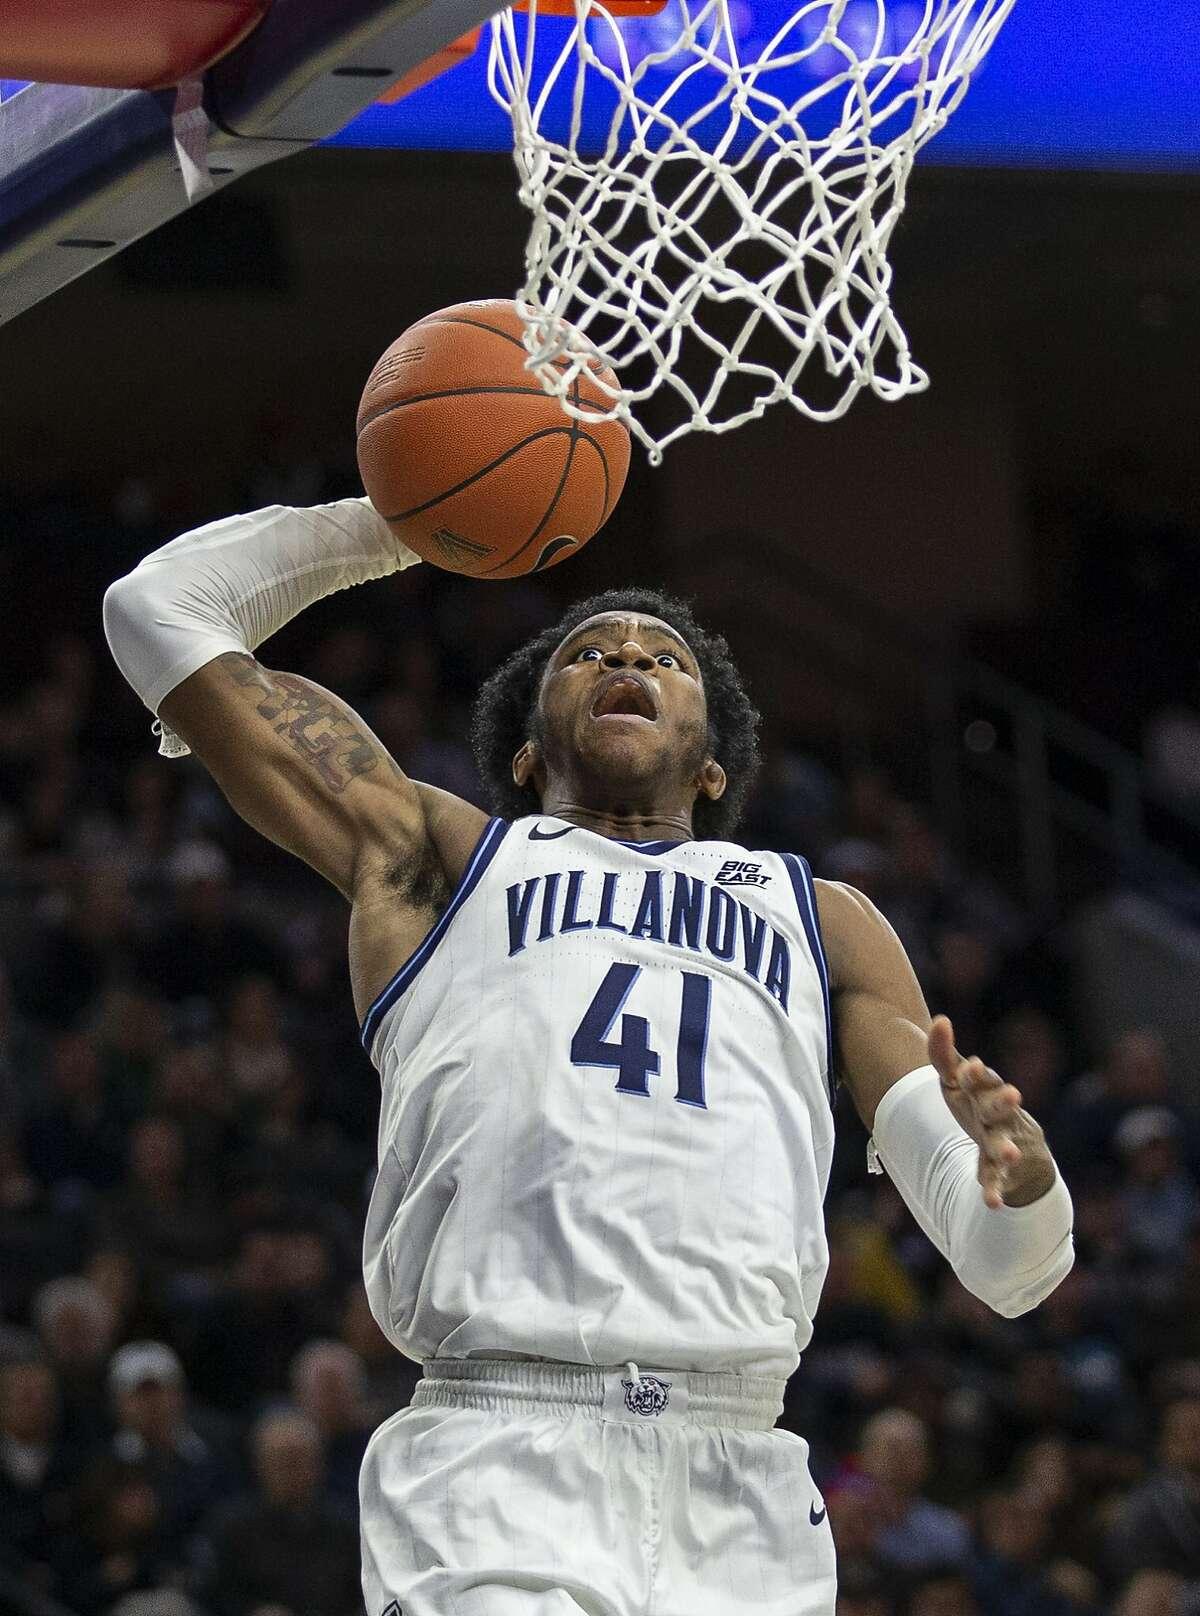 Villanova forward Saddiq Bey (41) in action during an NCAA college basketball game against Ohio Saturday, Nov. 16, 2019, in Philadelphia, Pa. (AP Photo/Laurence Kesterson)